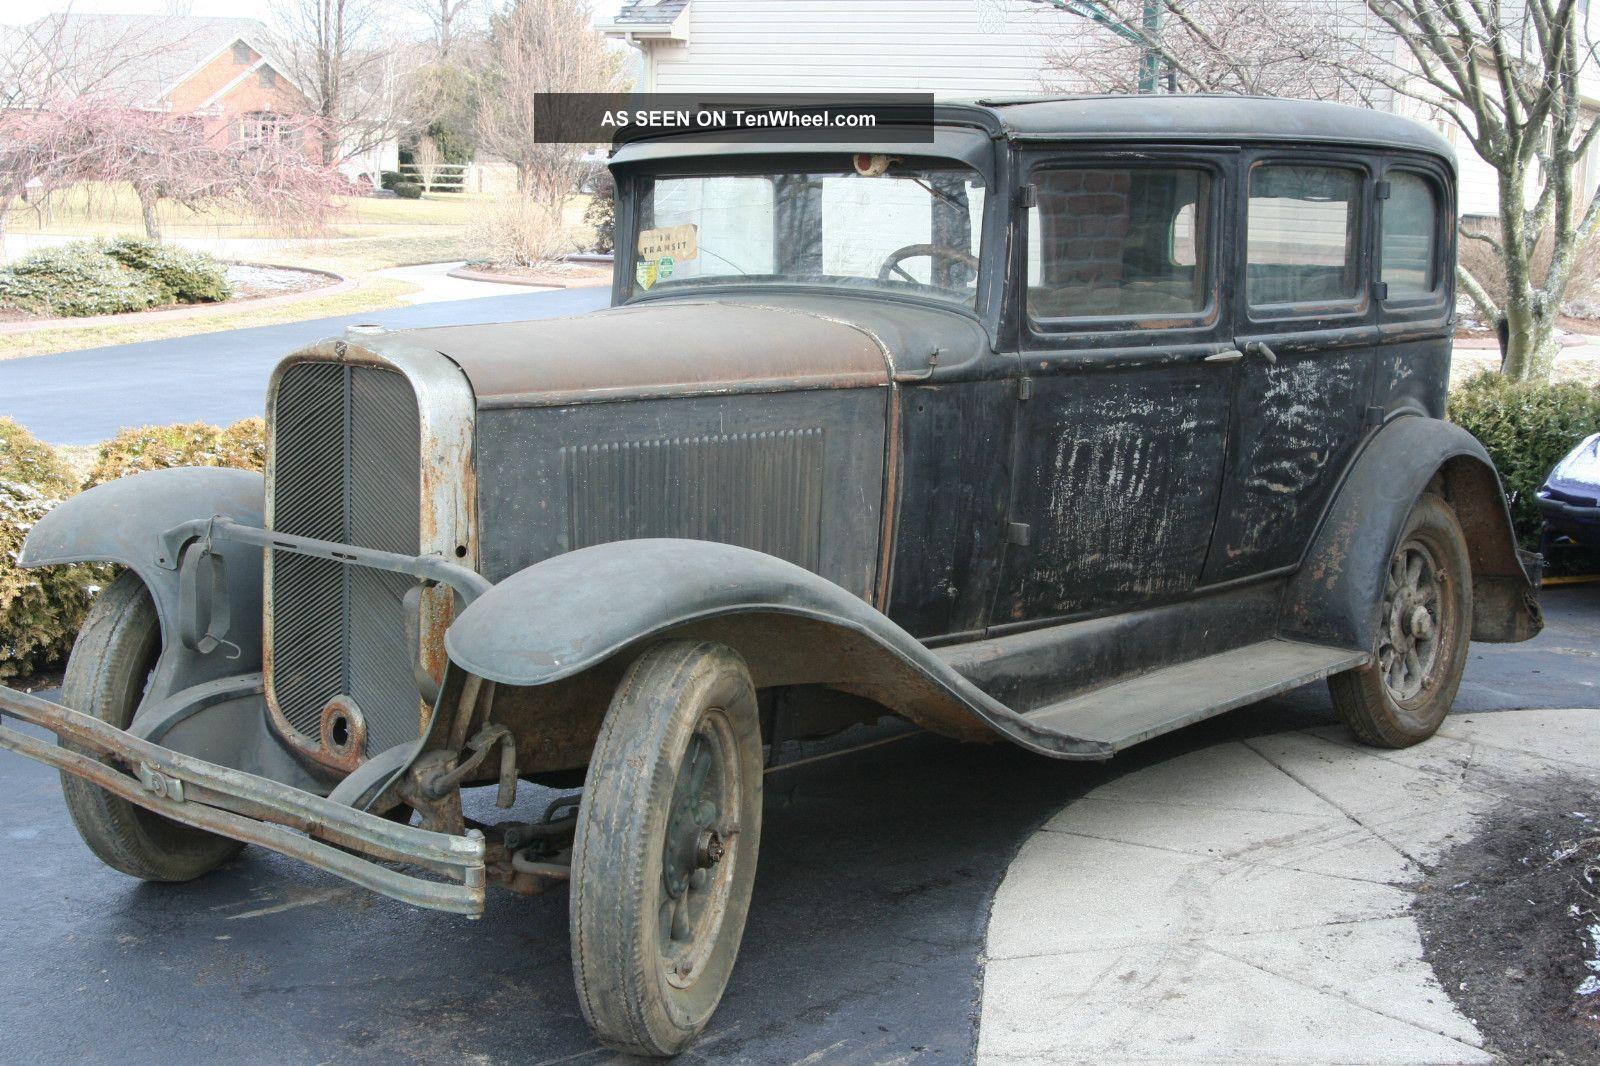 Rare 1930 buick marquette 4 door 1 yr prod 6cyl 3sp for 1930 chevy 4 door